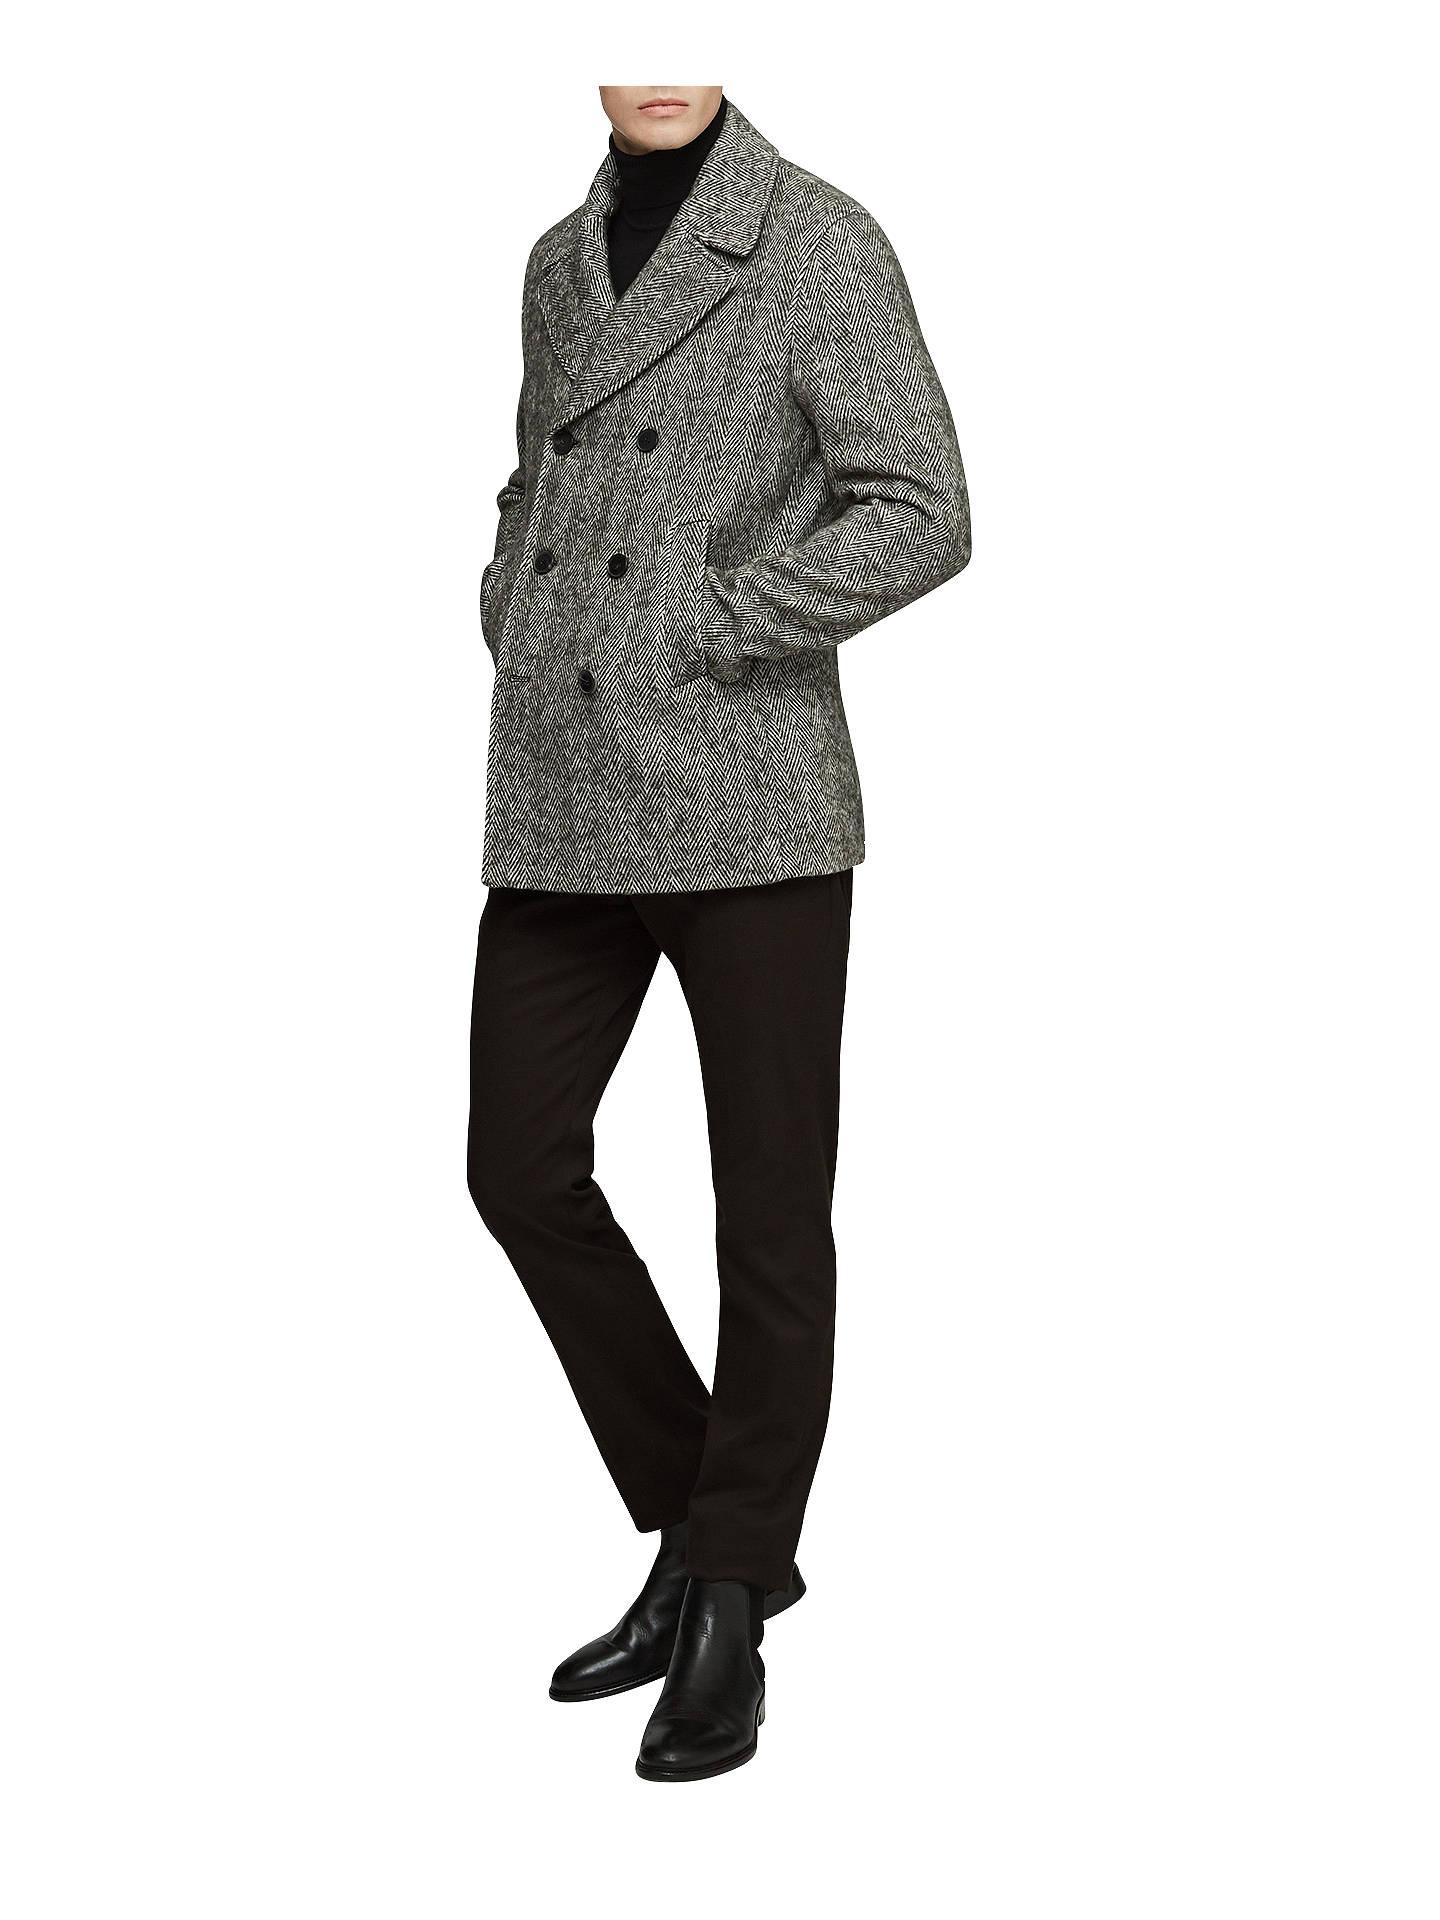 8a1a1e3841a ... Buy Reiss Bogart Herringbone Pea Coat